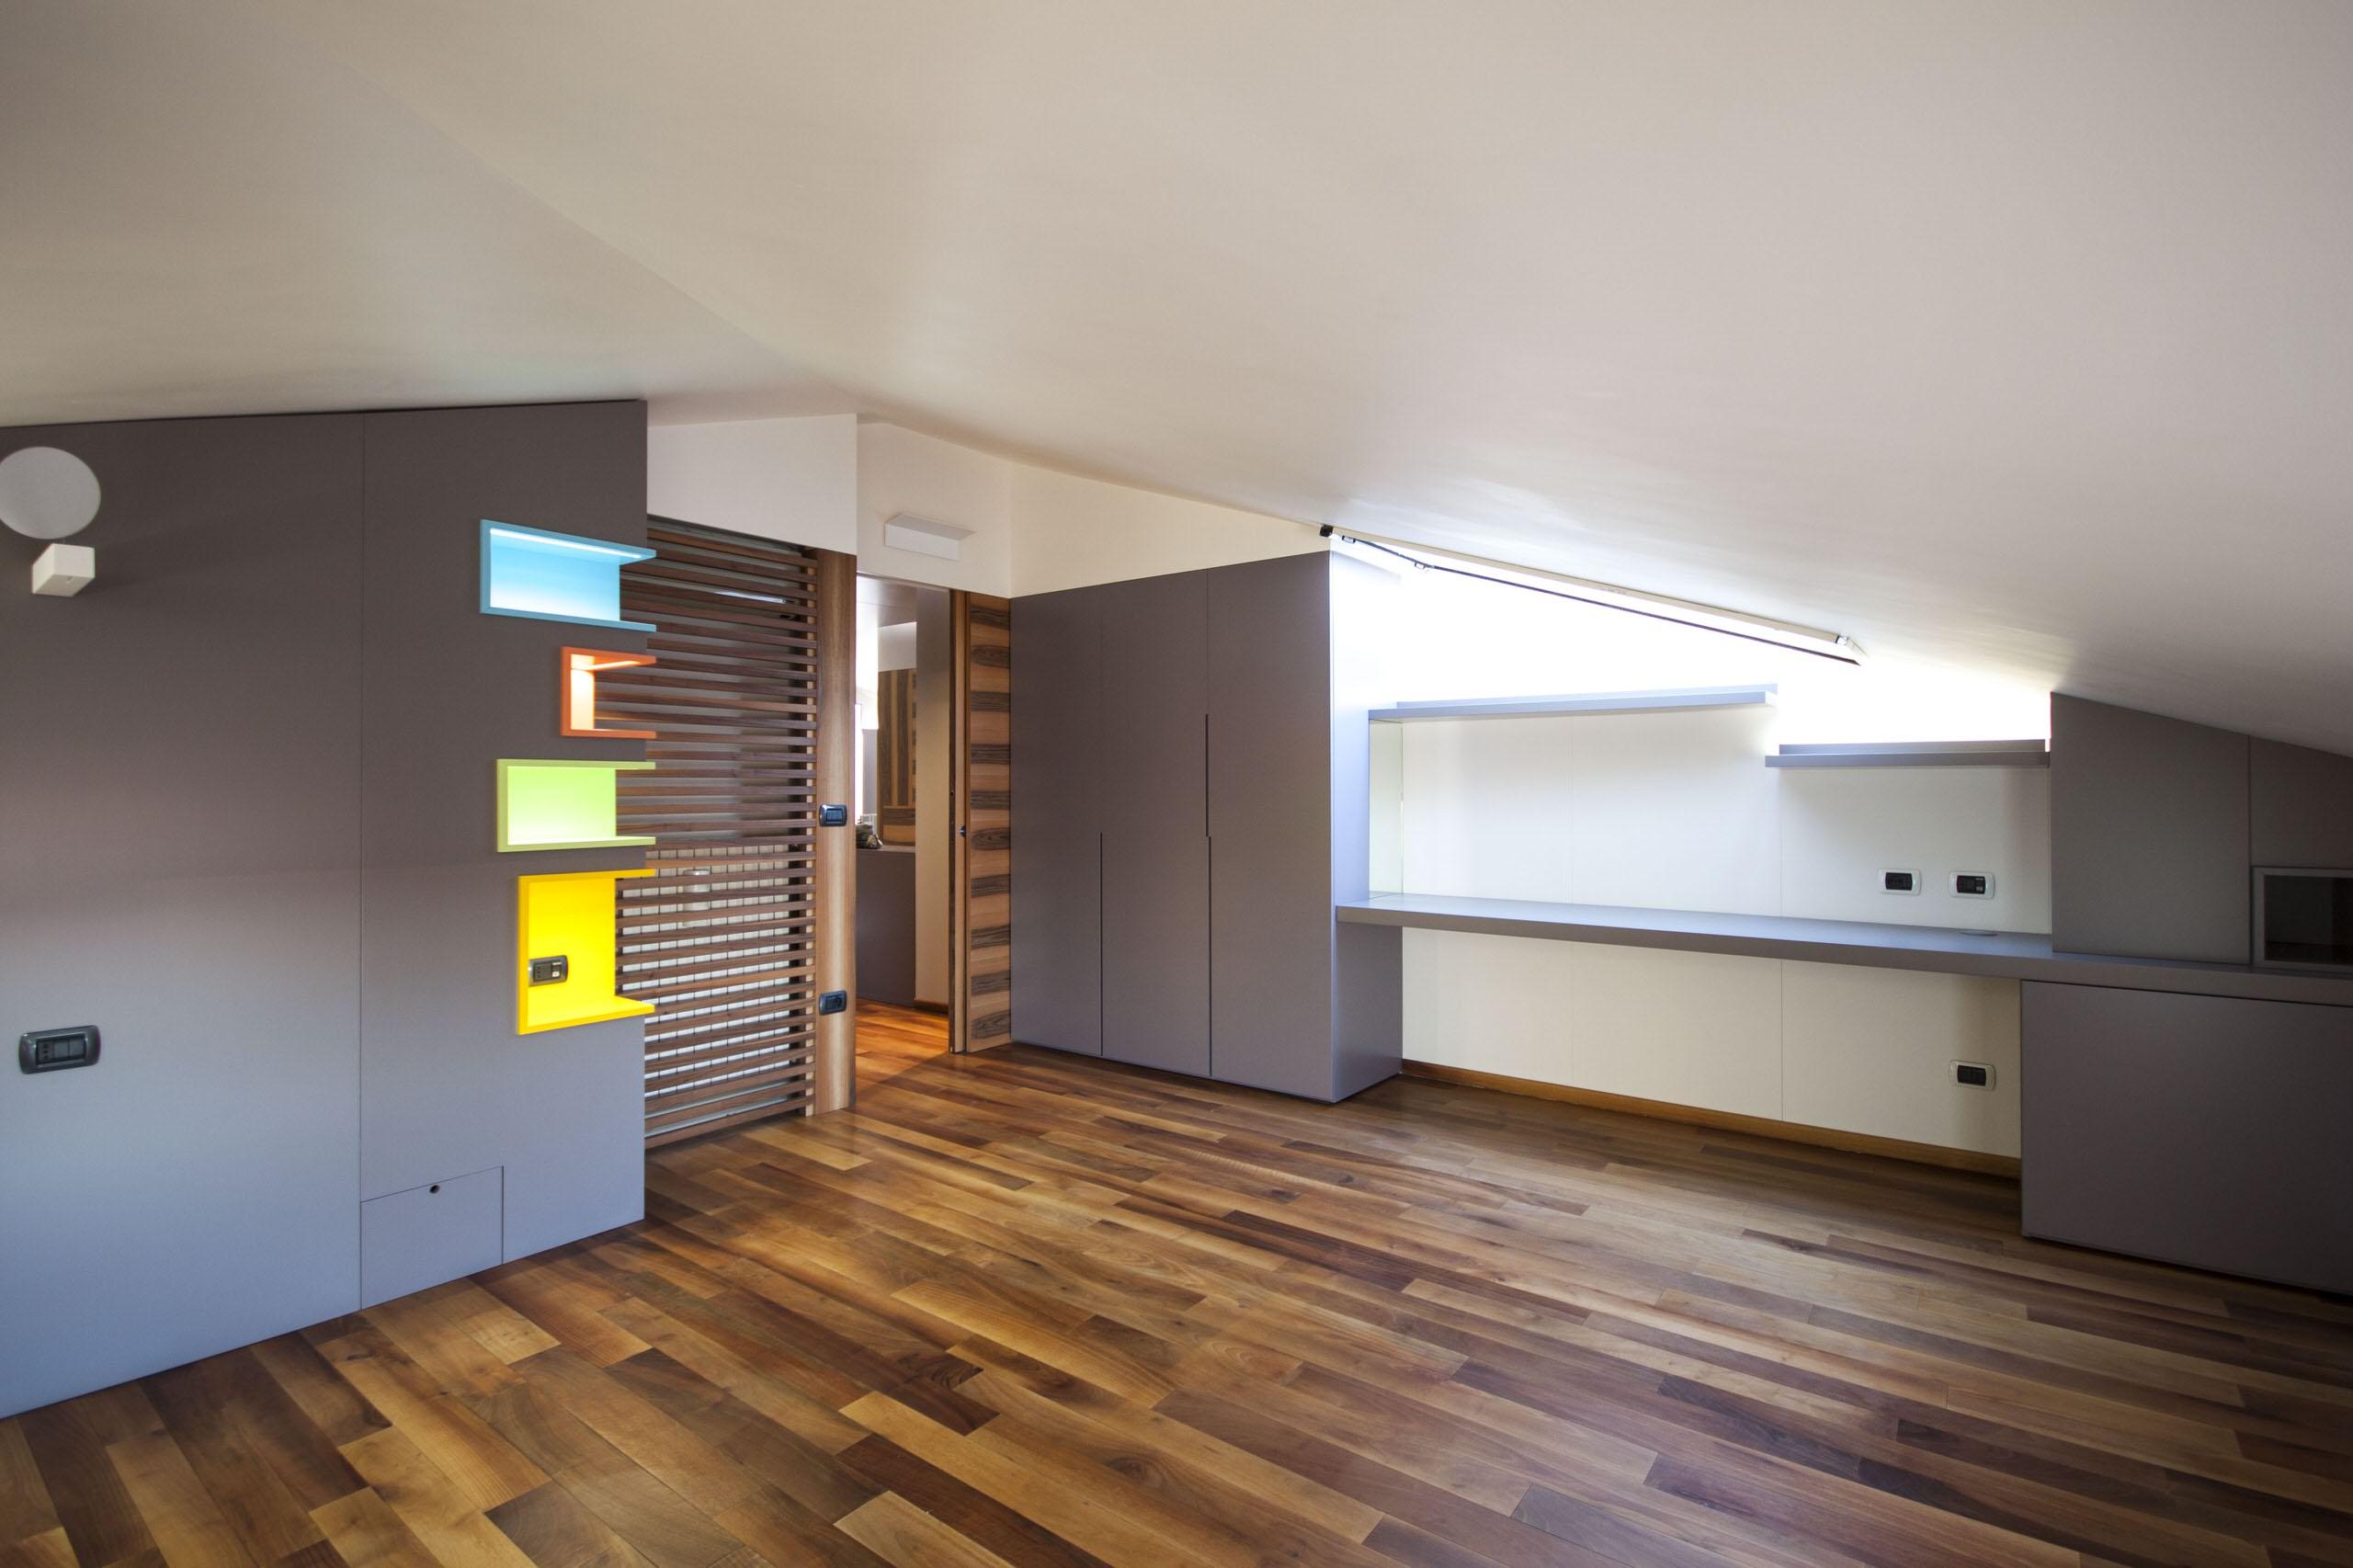 Appartamento_VAL_21.1